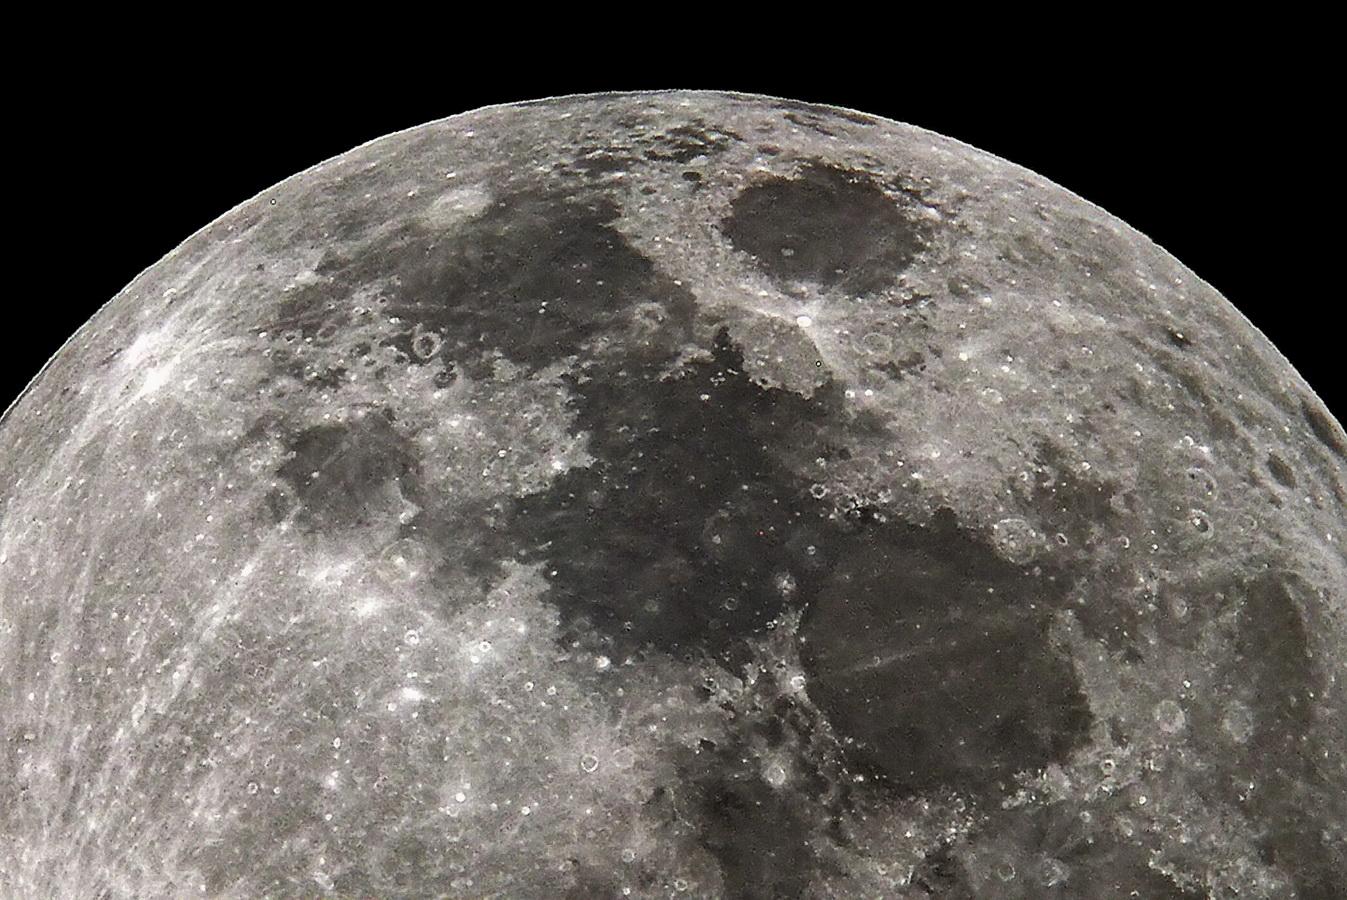 Detalle del disco lunar